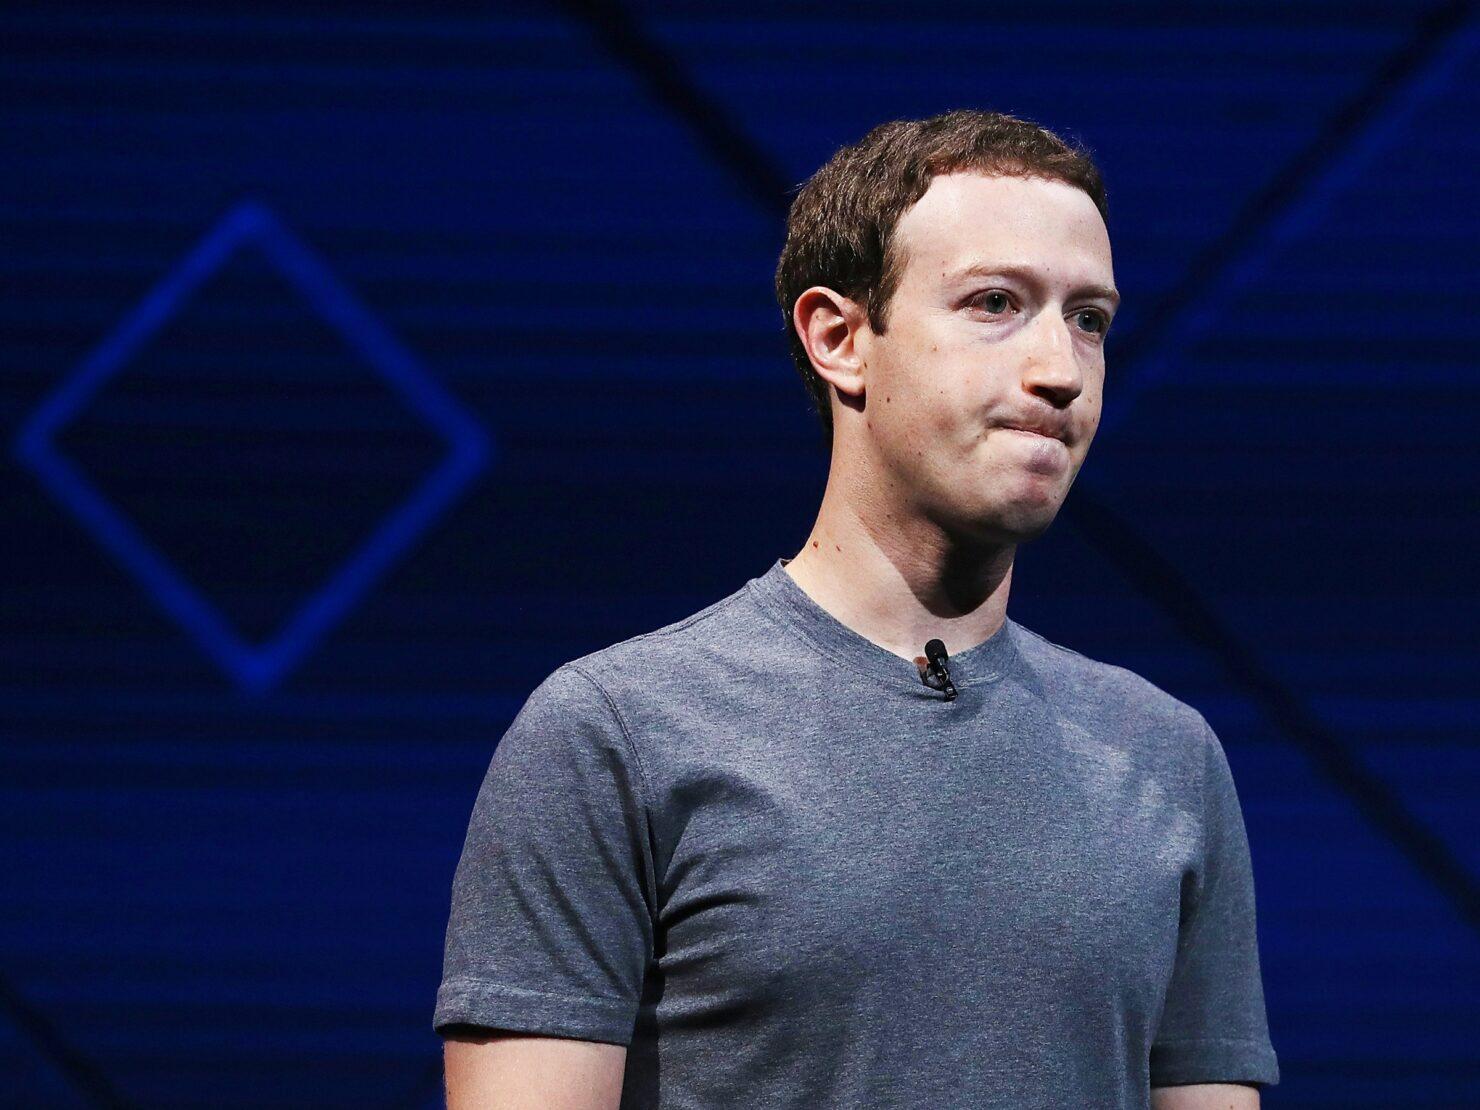 Zuckerberg election russia facebook twitter